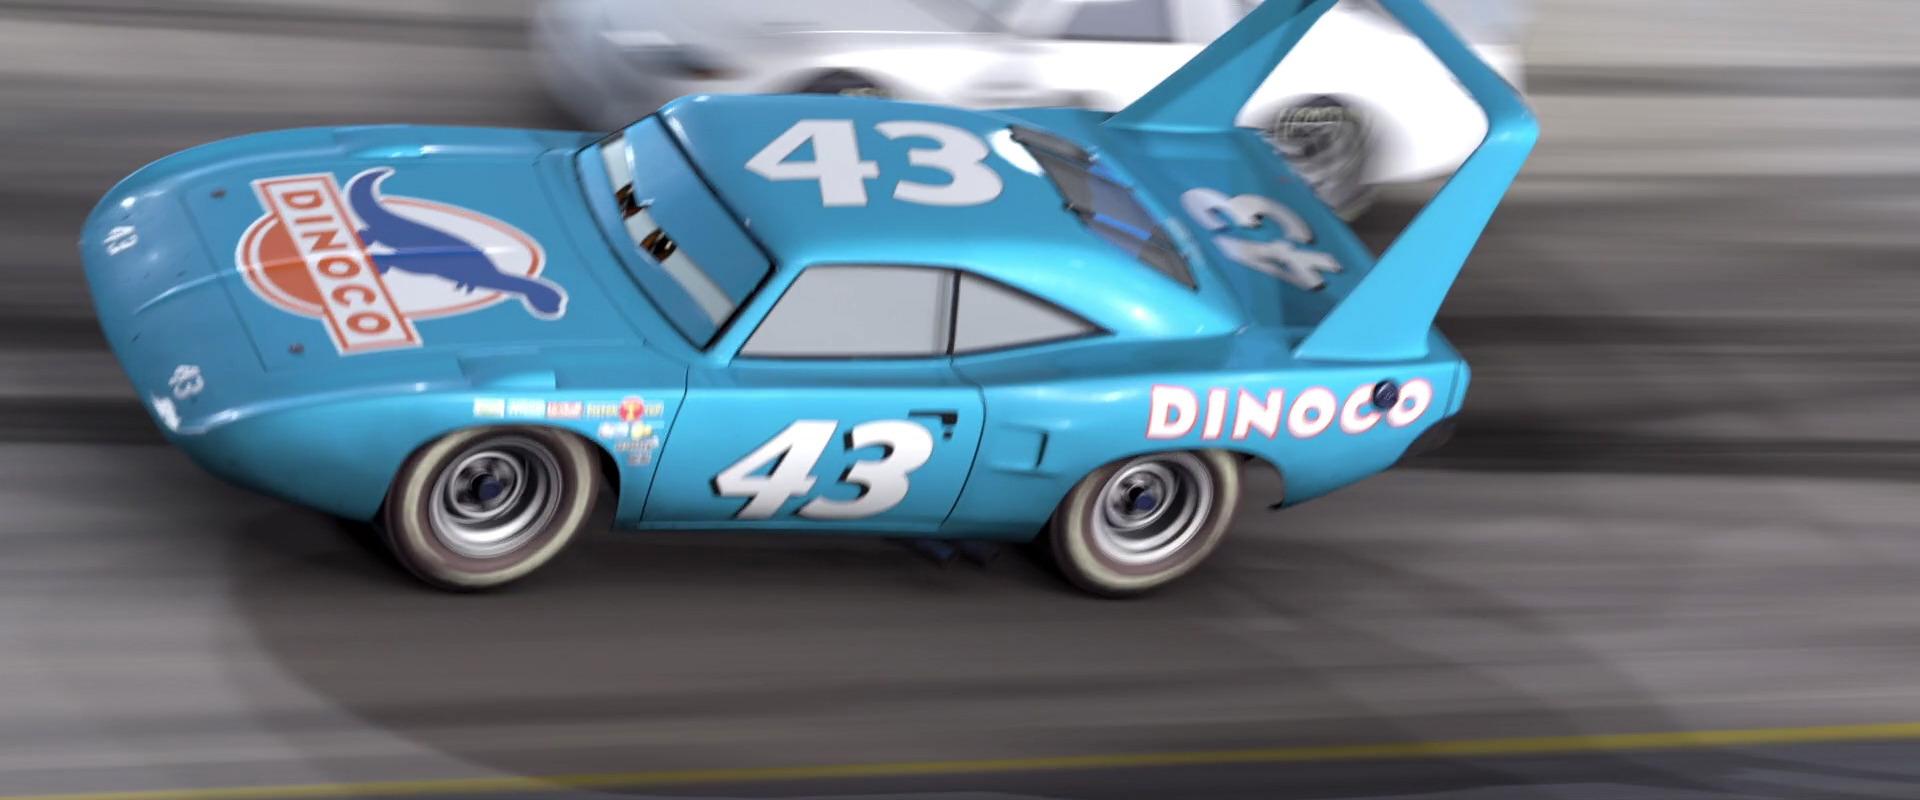 Uncategorized Cars The King image the king side view jpg pixar wiki fandom powered by wikia jpg